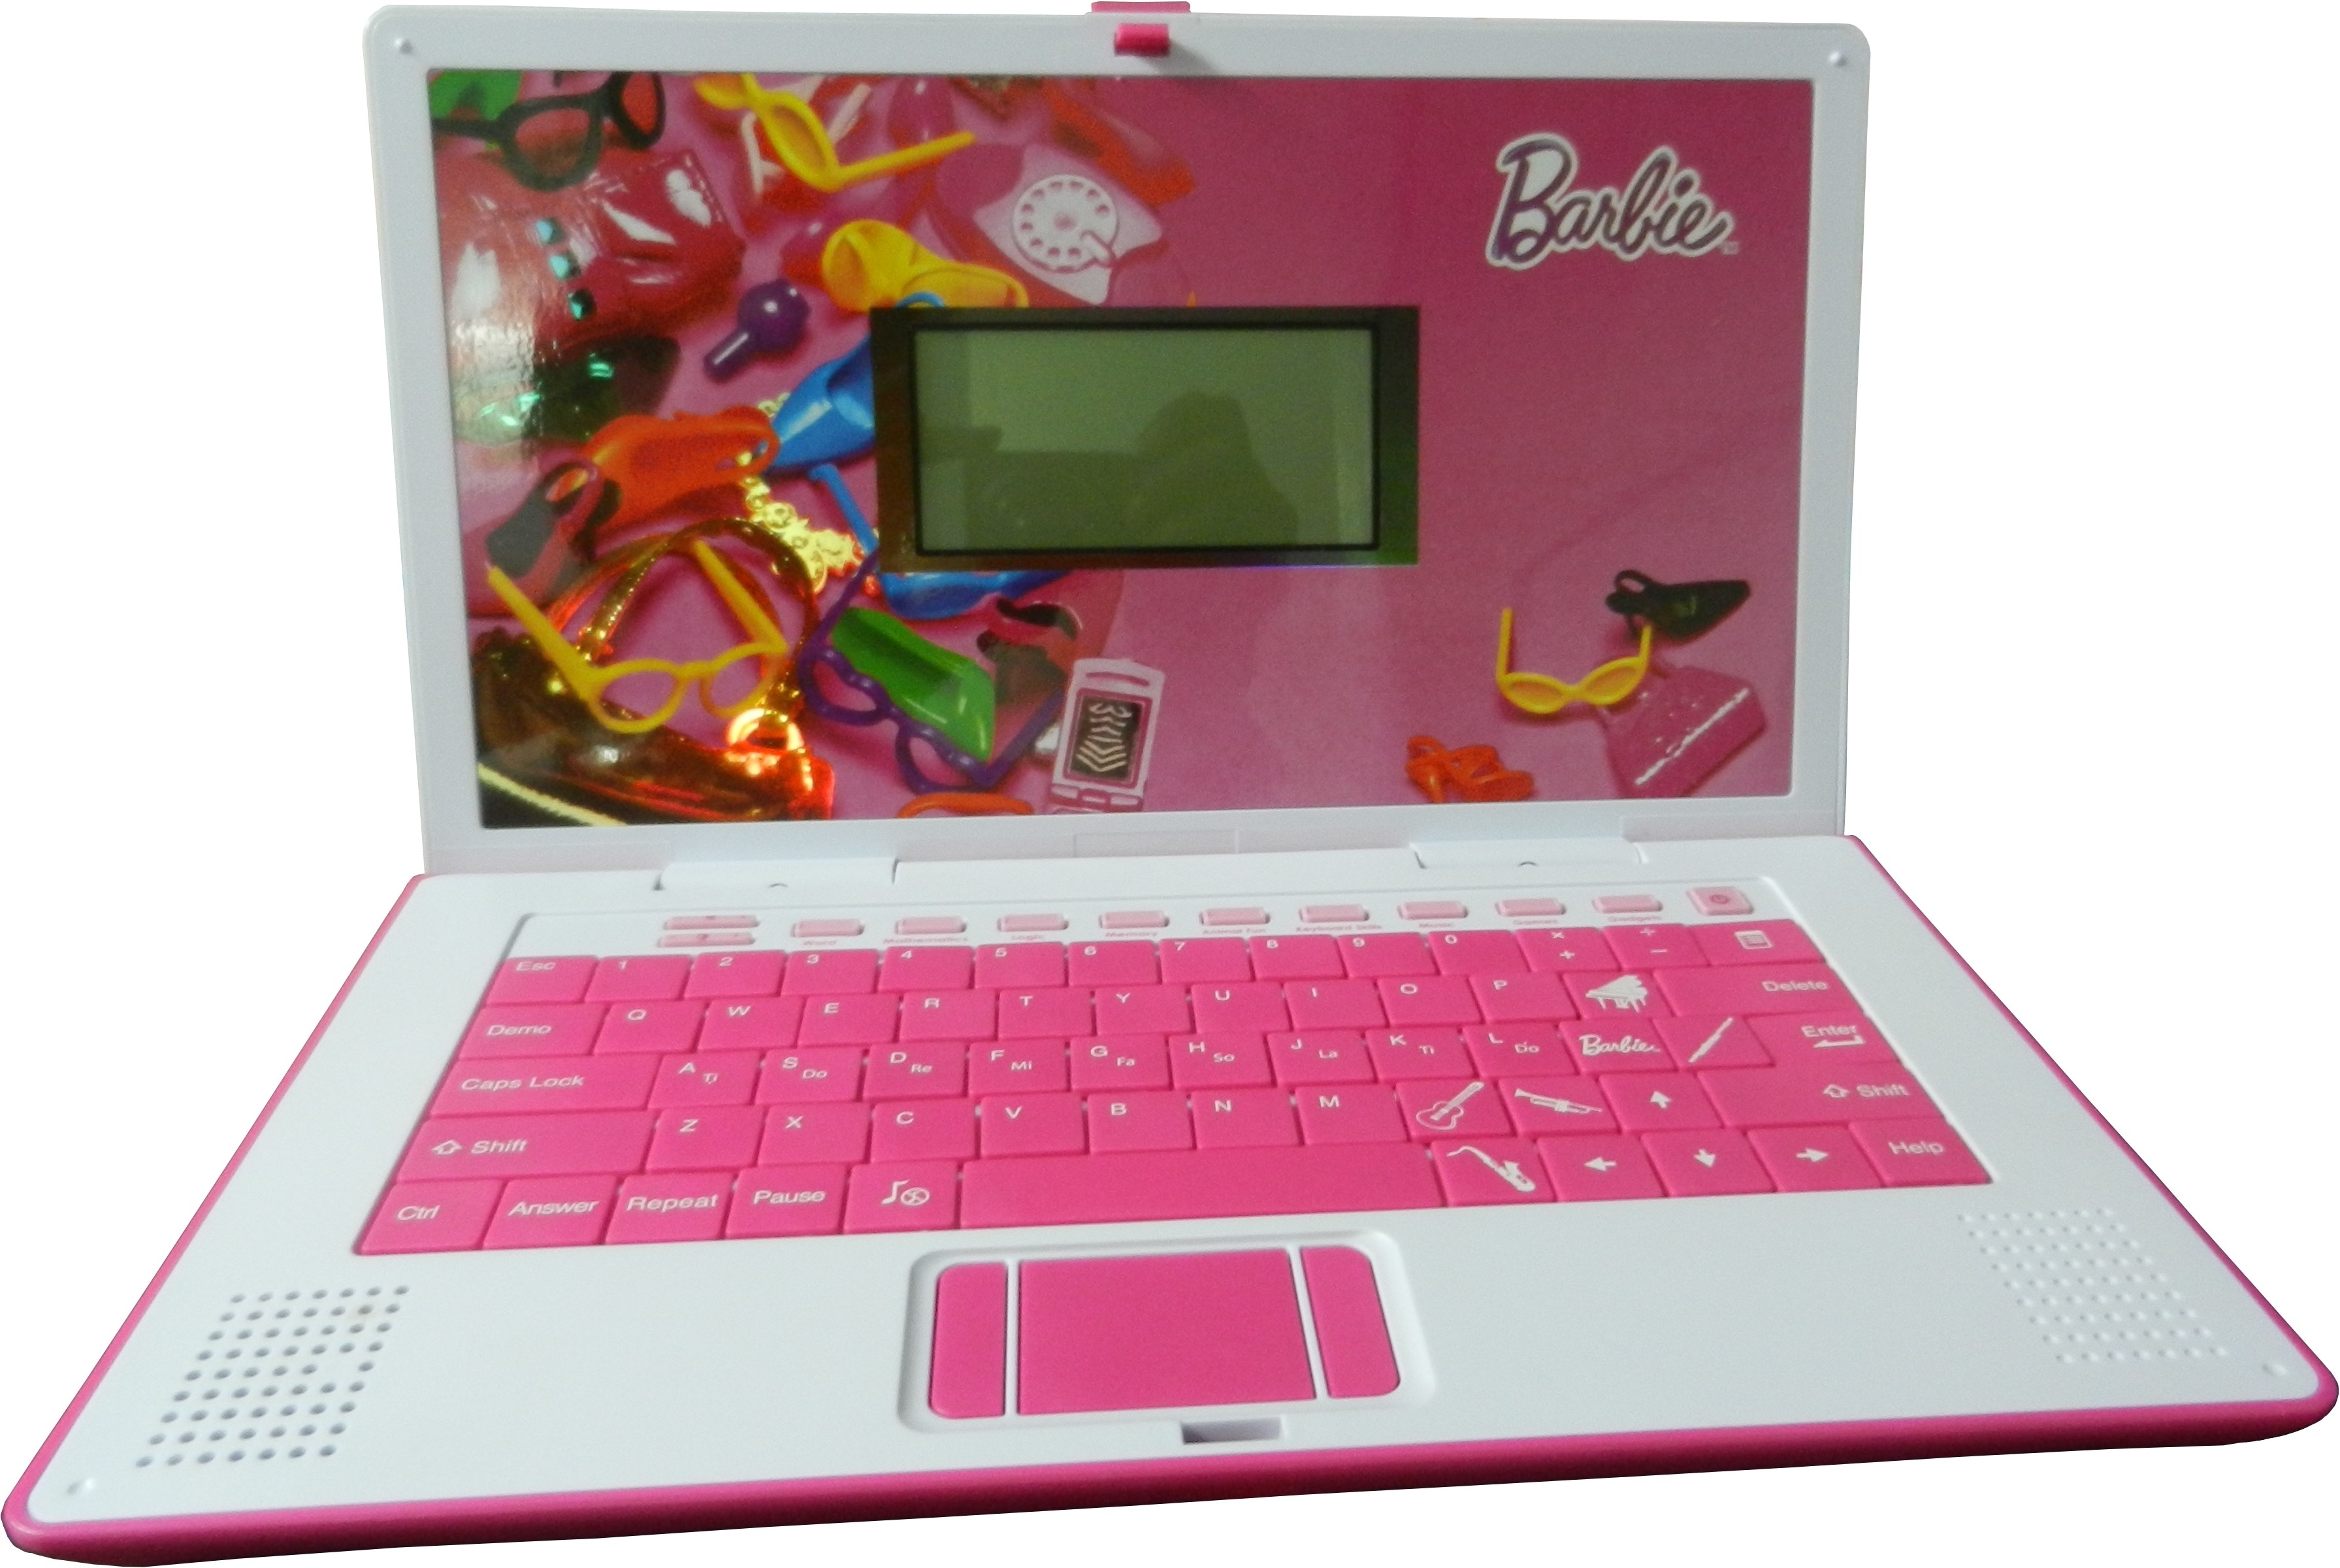 barbie b book laptop manual